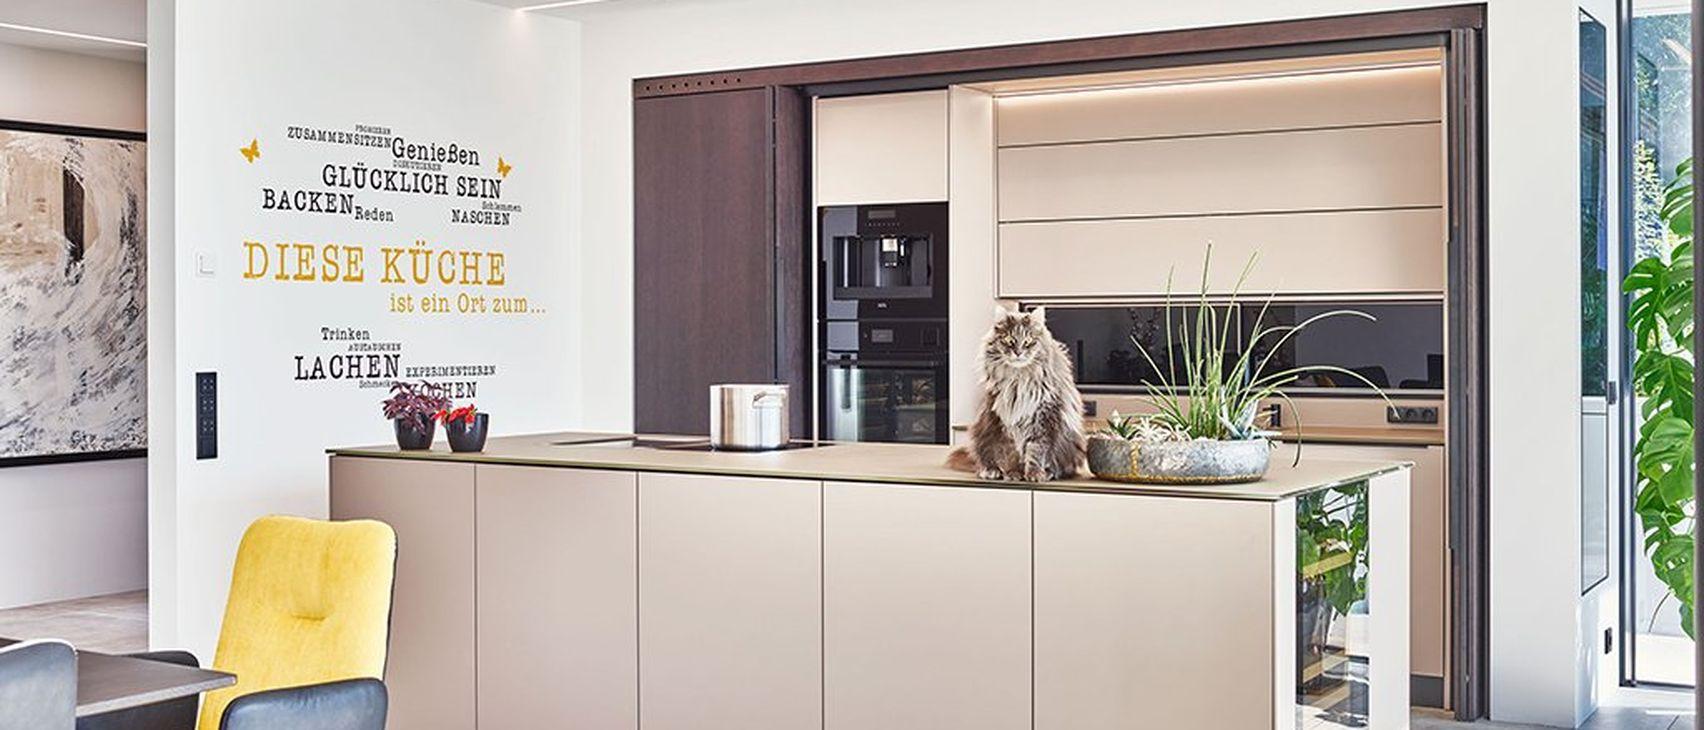 Full Size of Sideboard Küche 80 Cm Anrichte Küche Roller Küchenanrichte Höhe Anrichte Küche Kiefer Küche Anrichte Küche